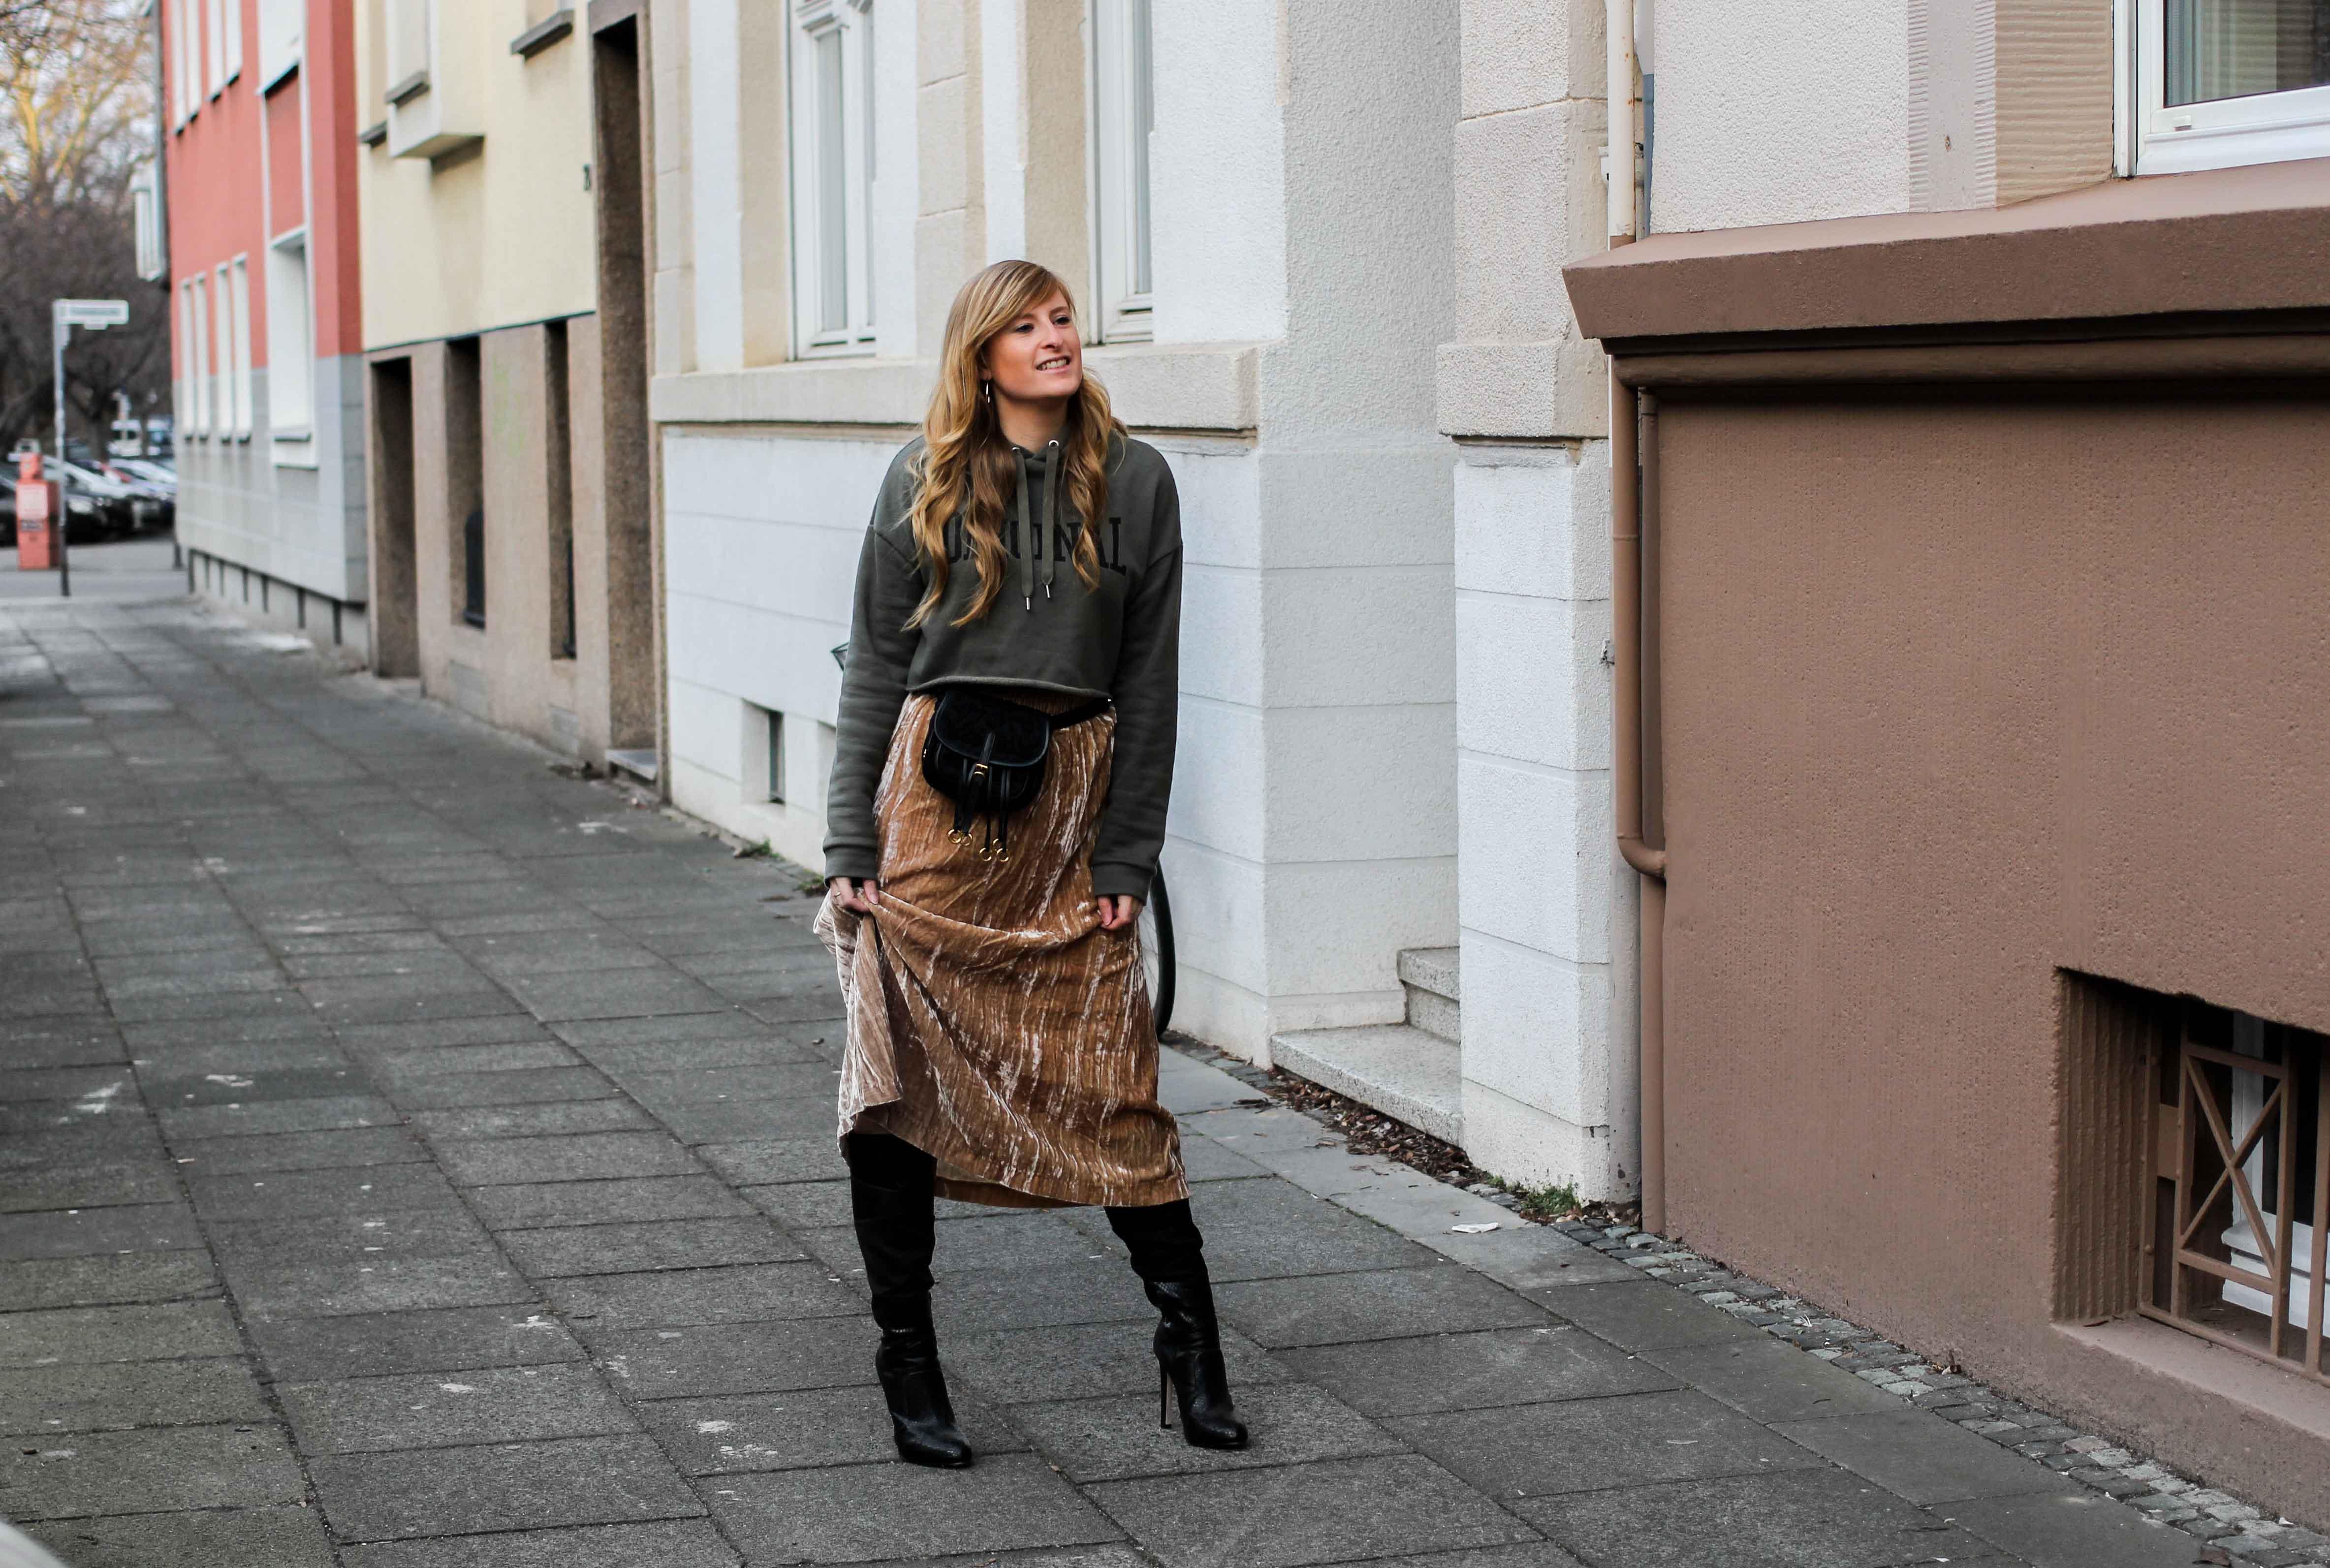 Trendtasche 2019 Gürteltasche kombiniern Gürteltasche Prada Streetstyle Outfit Bonn Frühling Look Crop Pullover 7